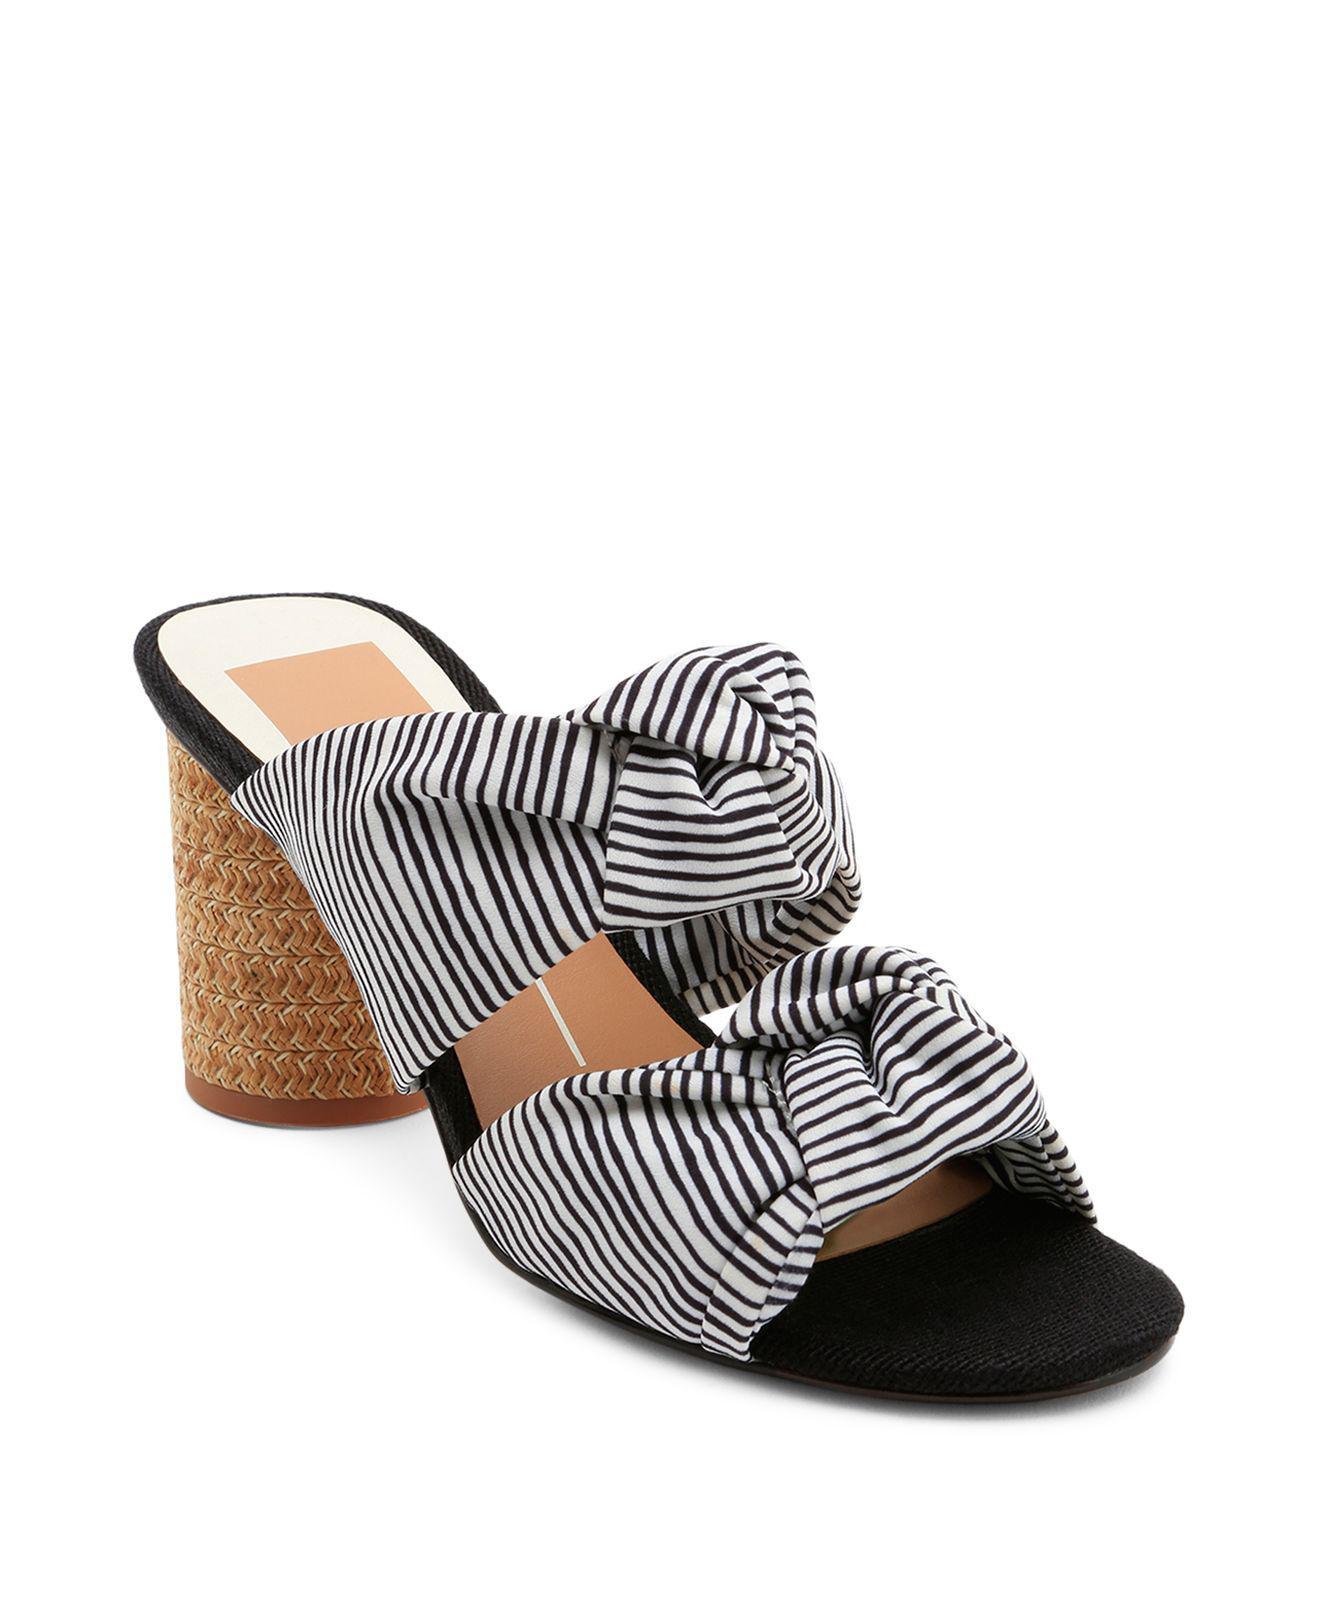 Dolce Vita Jene Denim Double Knot Block Heel Sandals E20Qs